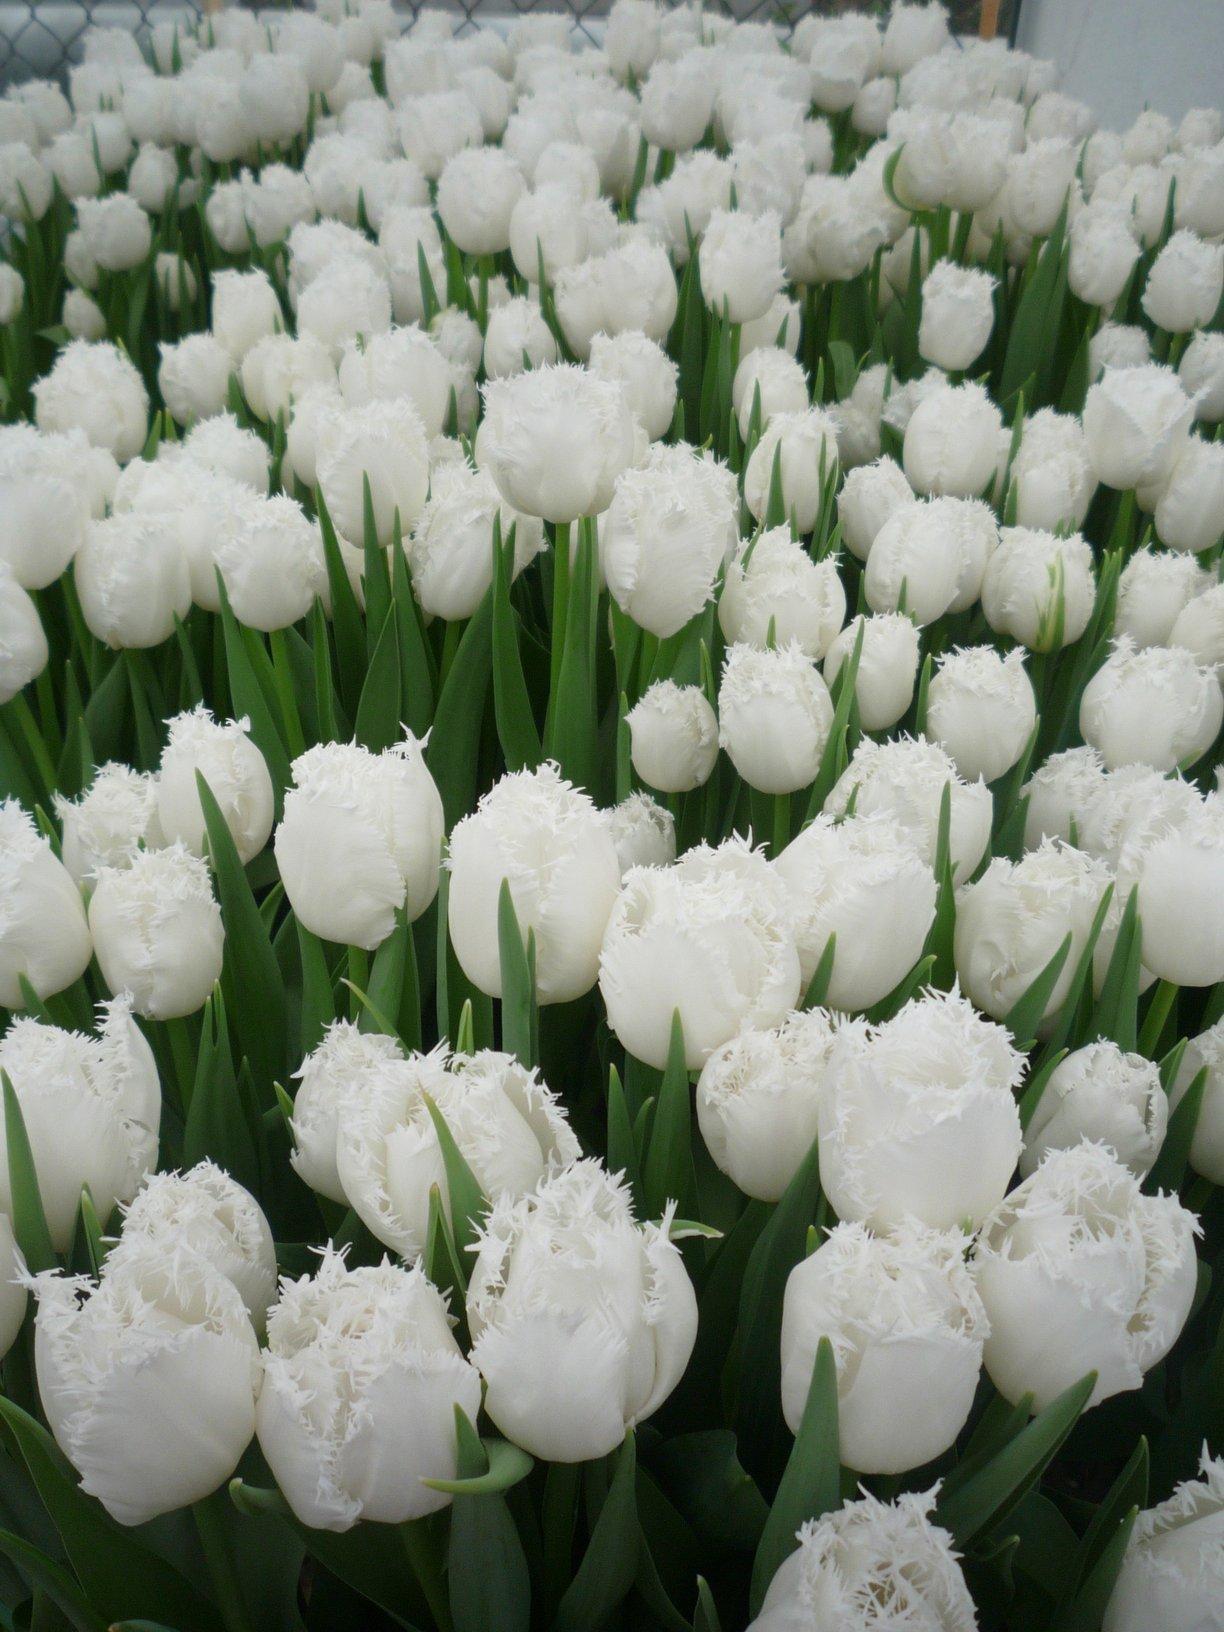 Белые тюльпаны. Блиц: белые цветы